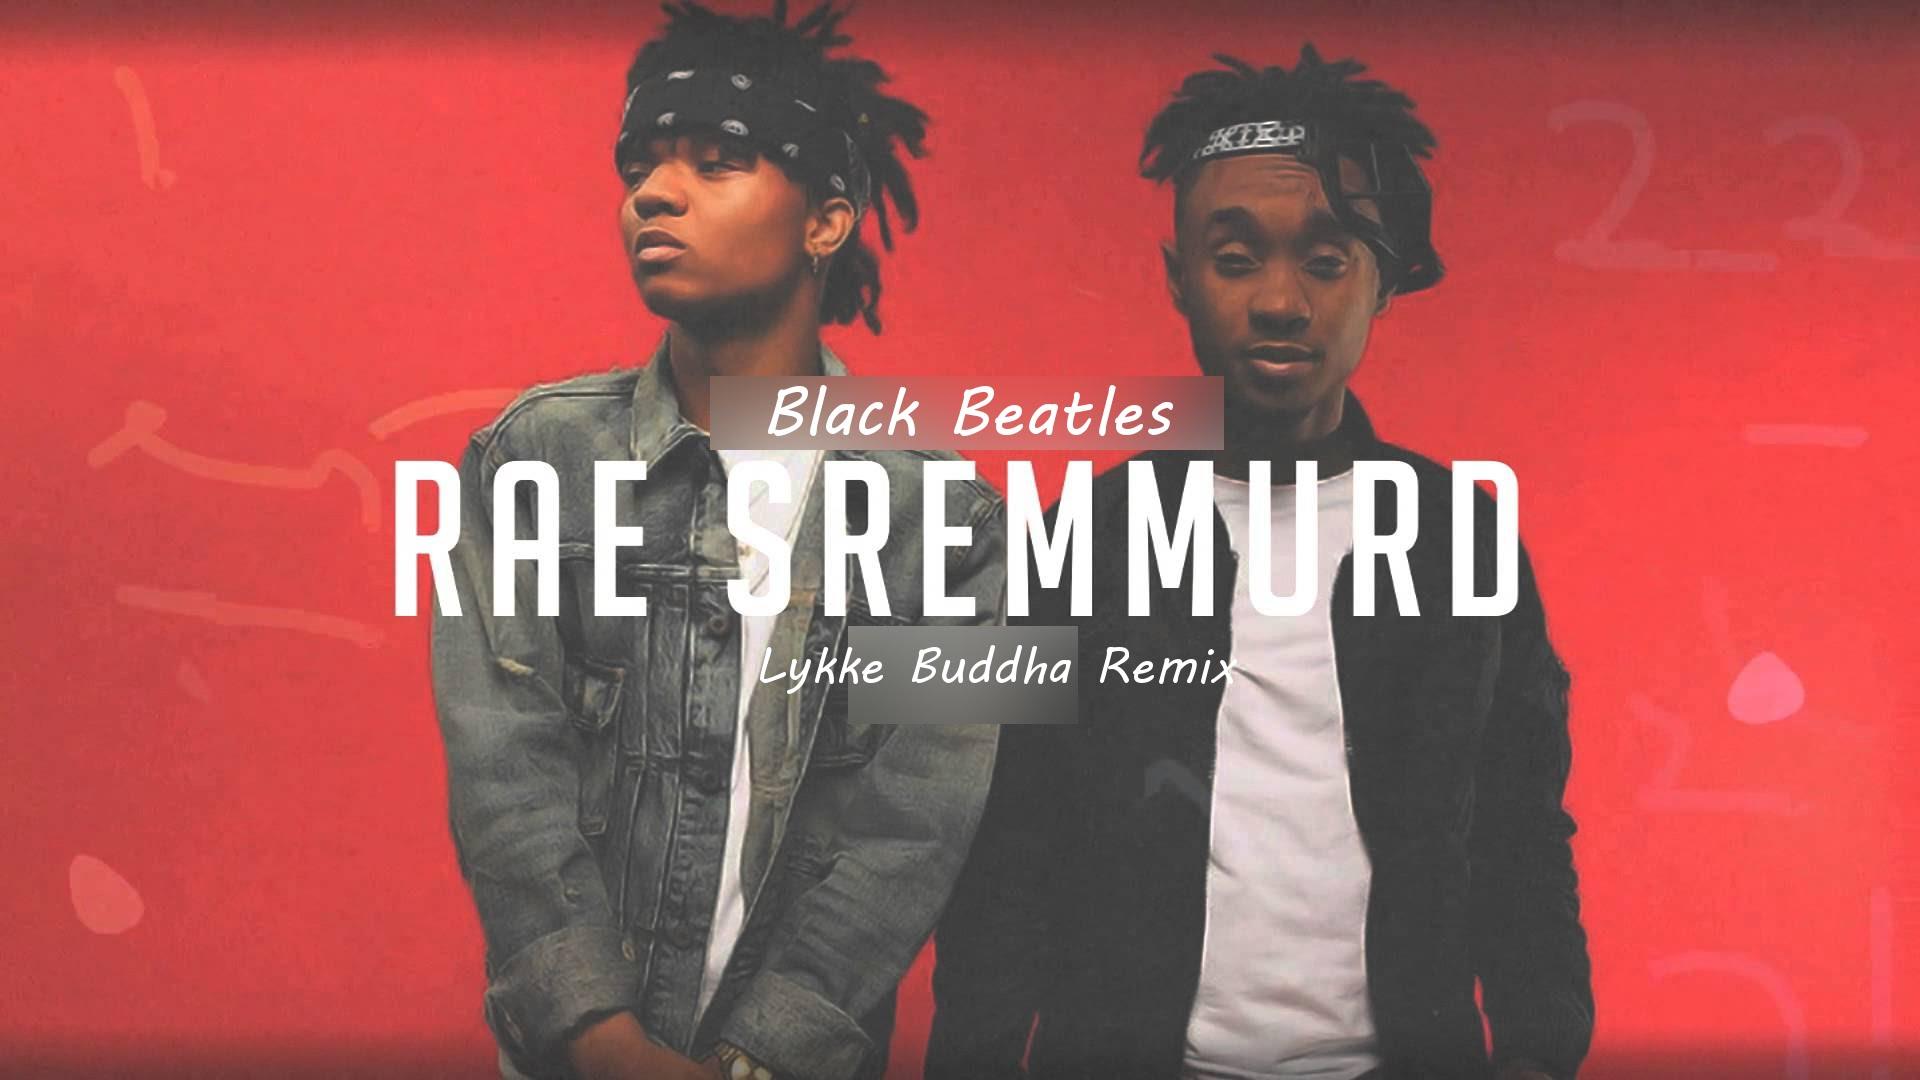 Rae Sremmurd - Black Beatles (Lykke Buddha Remix)